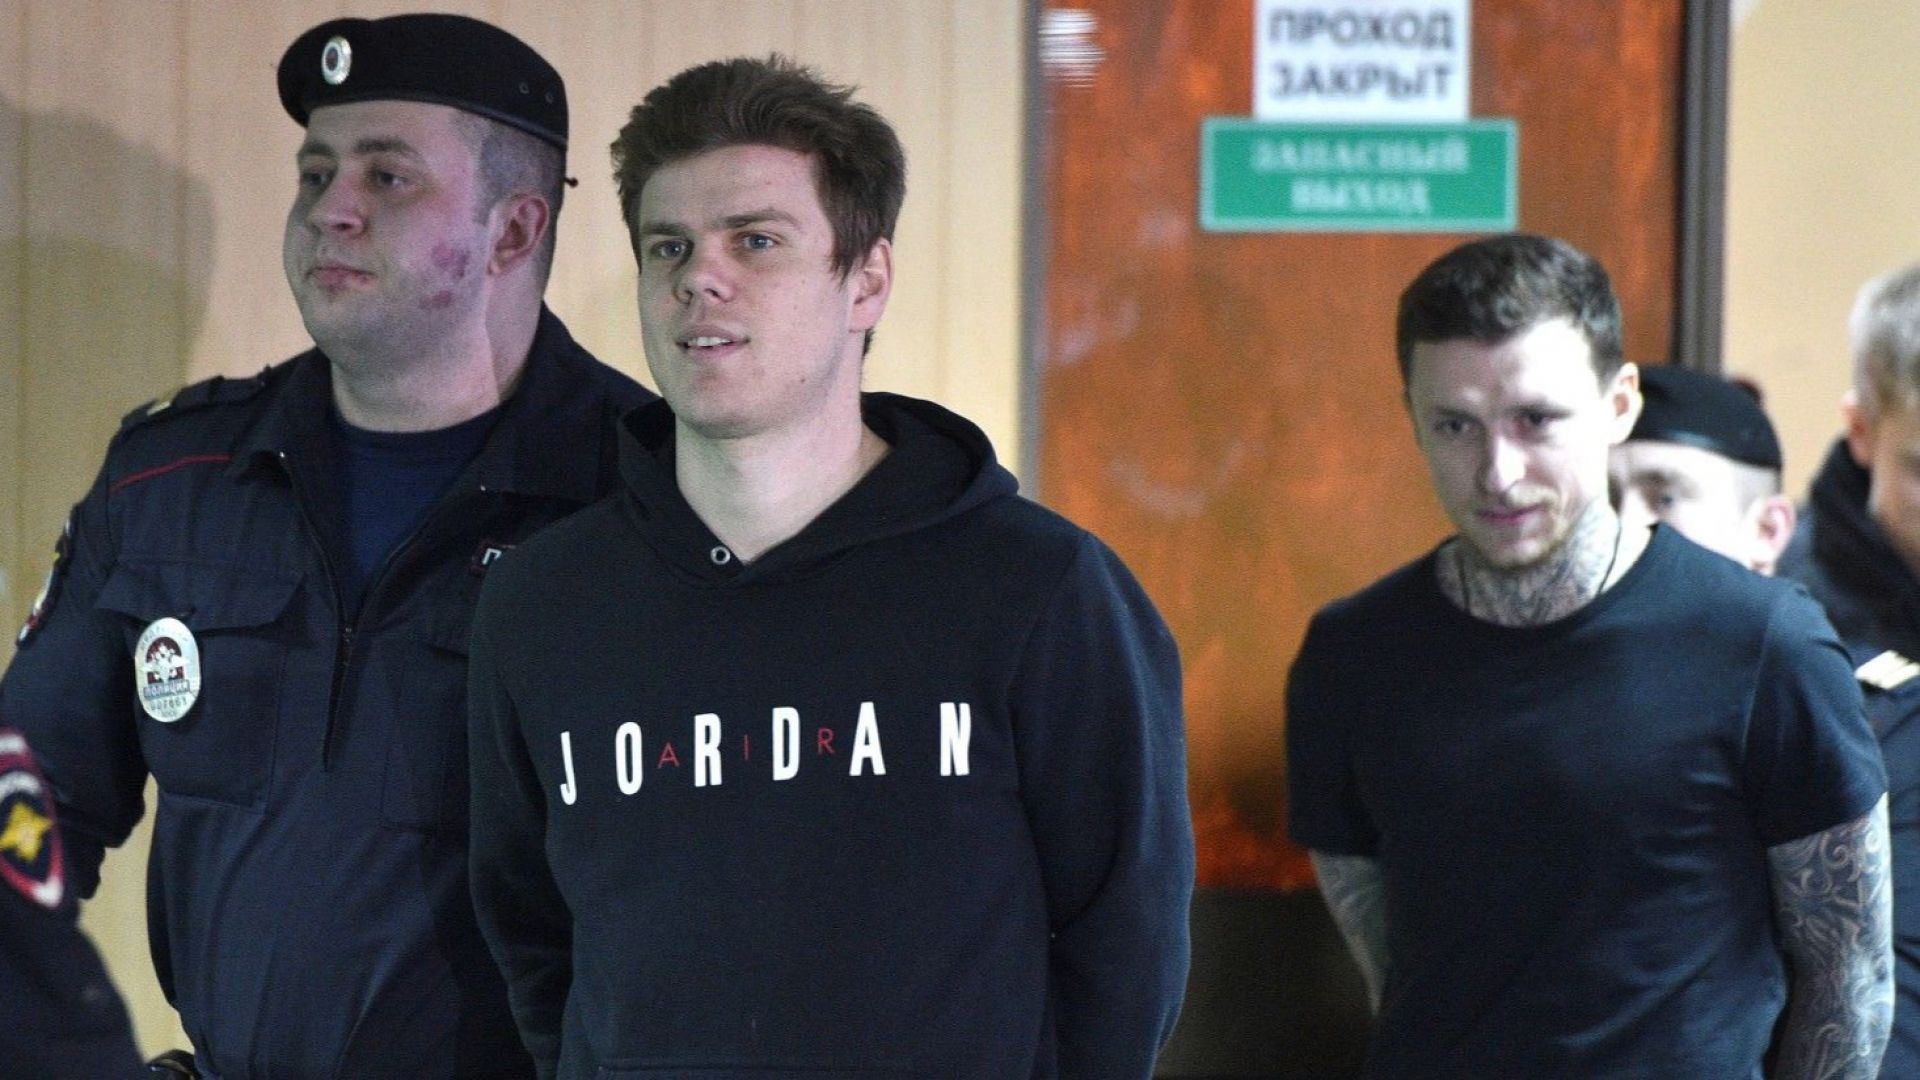 Поискаха 18 месеца затвор за руските национали-побойници, чака се присъдата